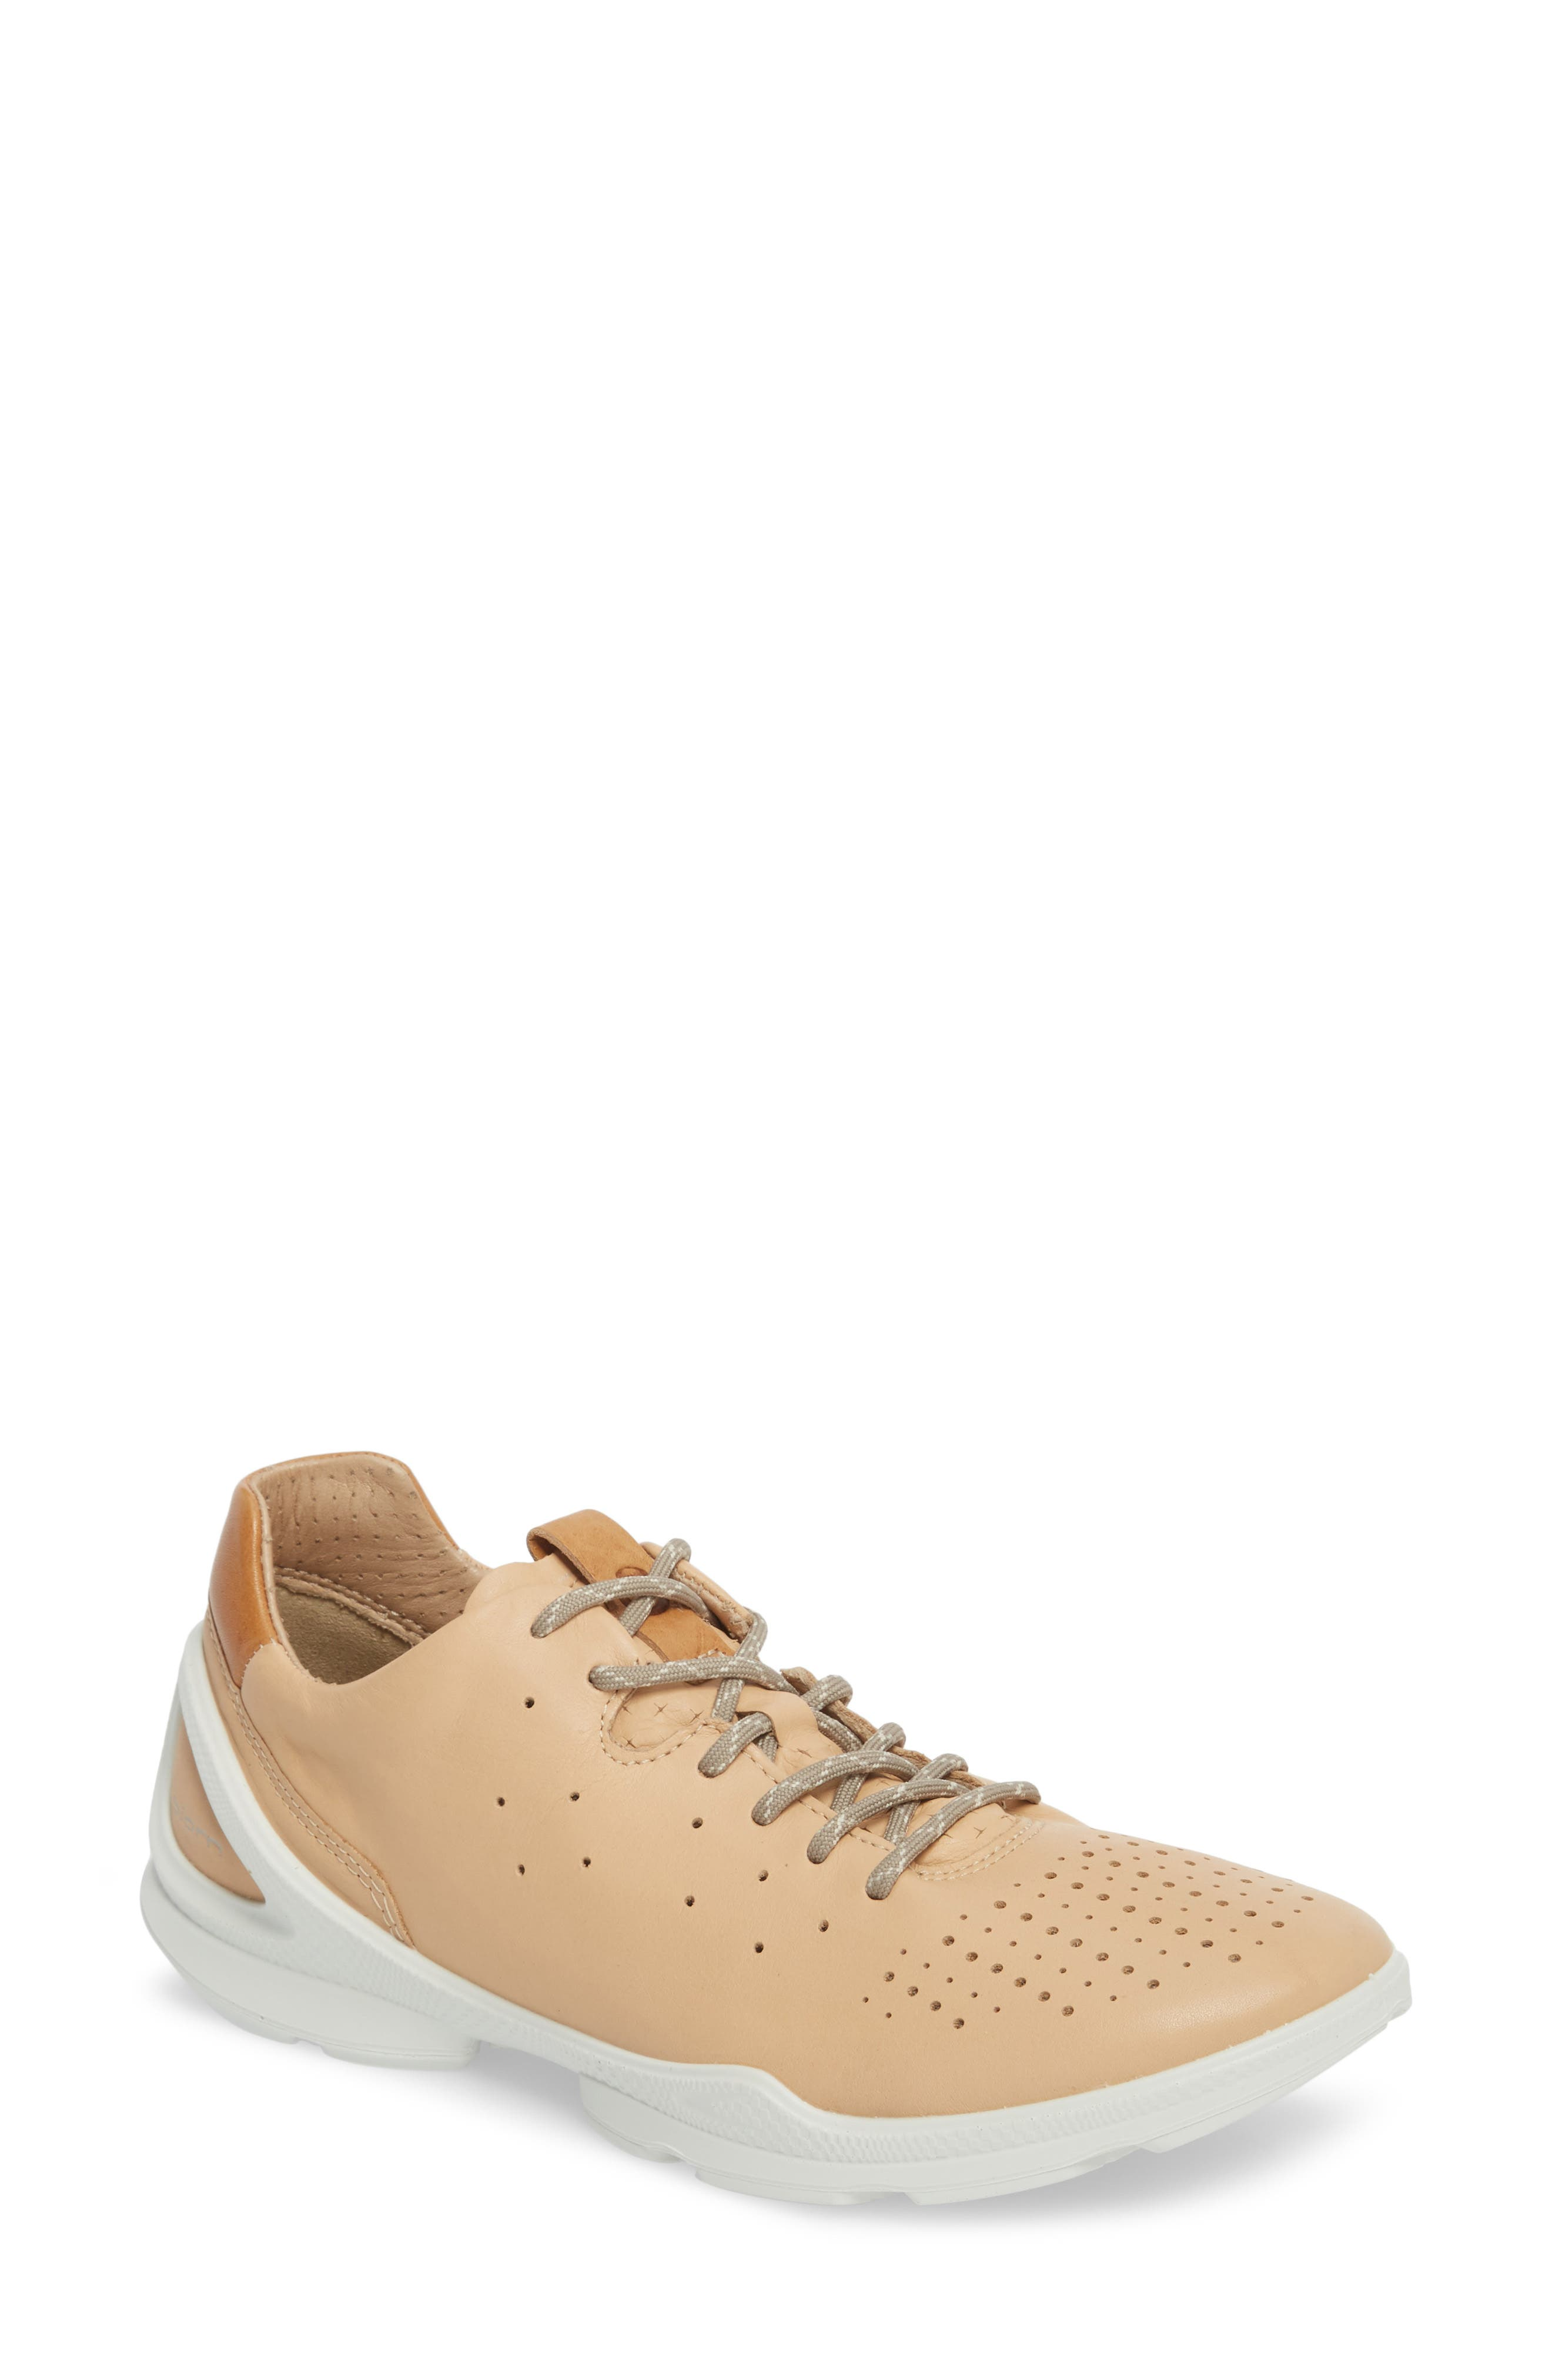 Biom Street Sneaker,                             Main thumbnail 1, color,                             Powder Leather